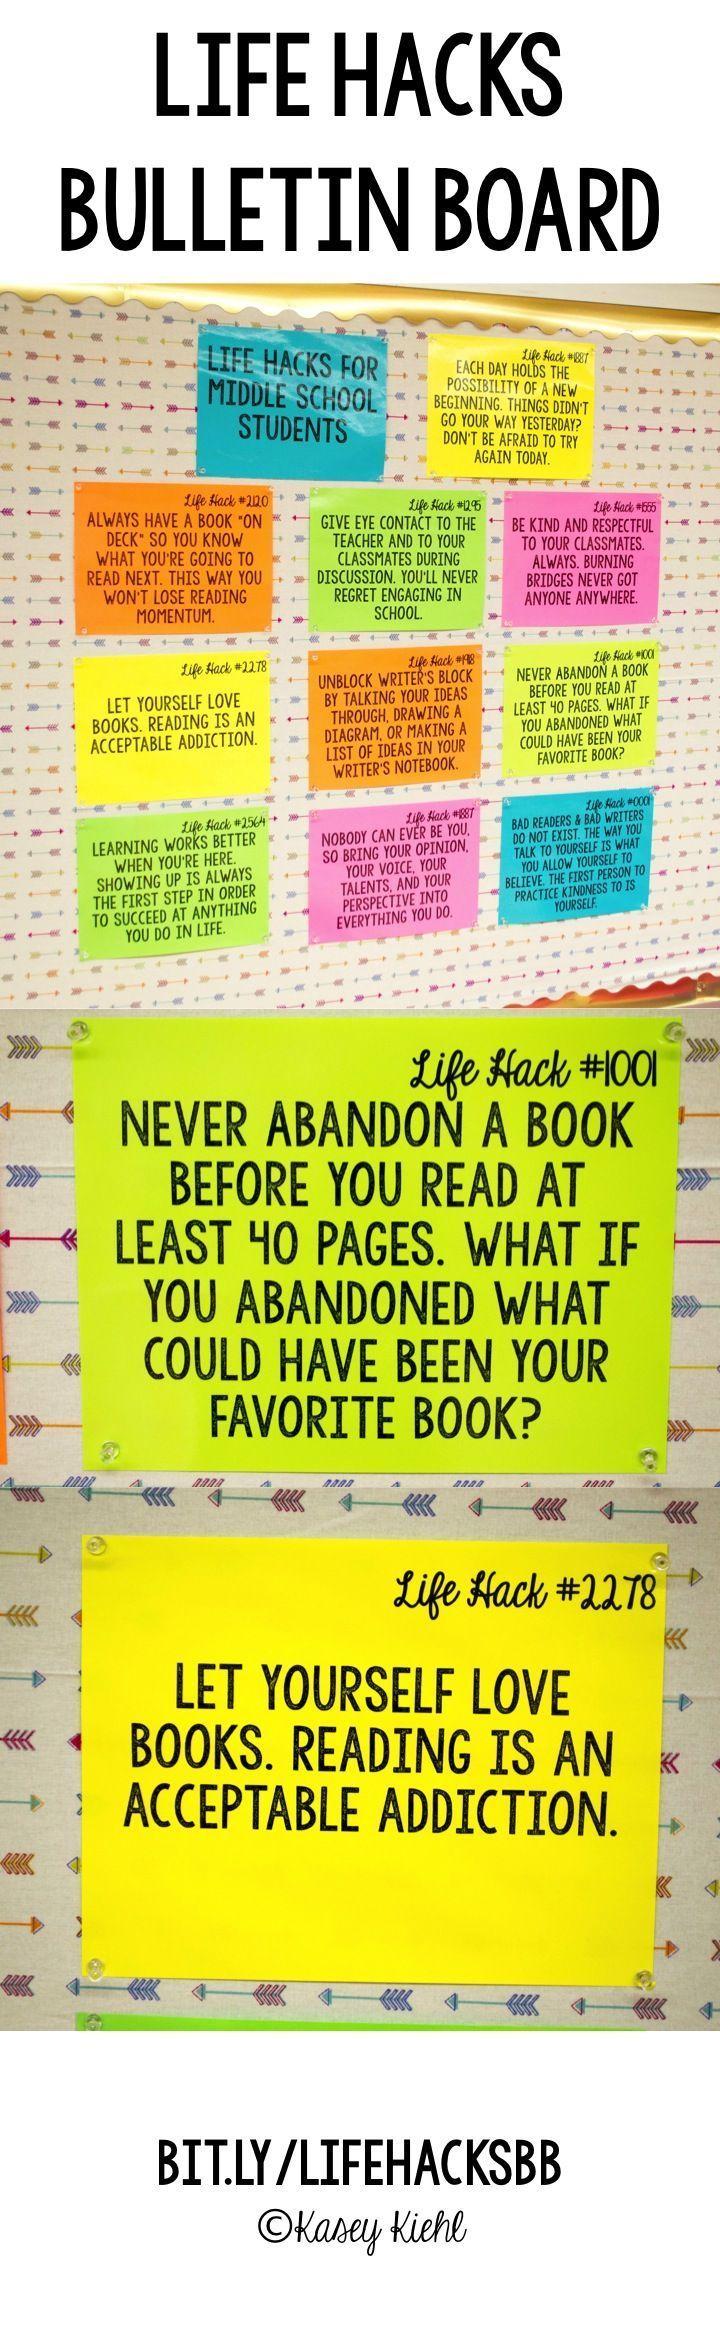 389 best bulletin boards images on Pinterest | Classroom ideas ...